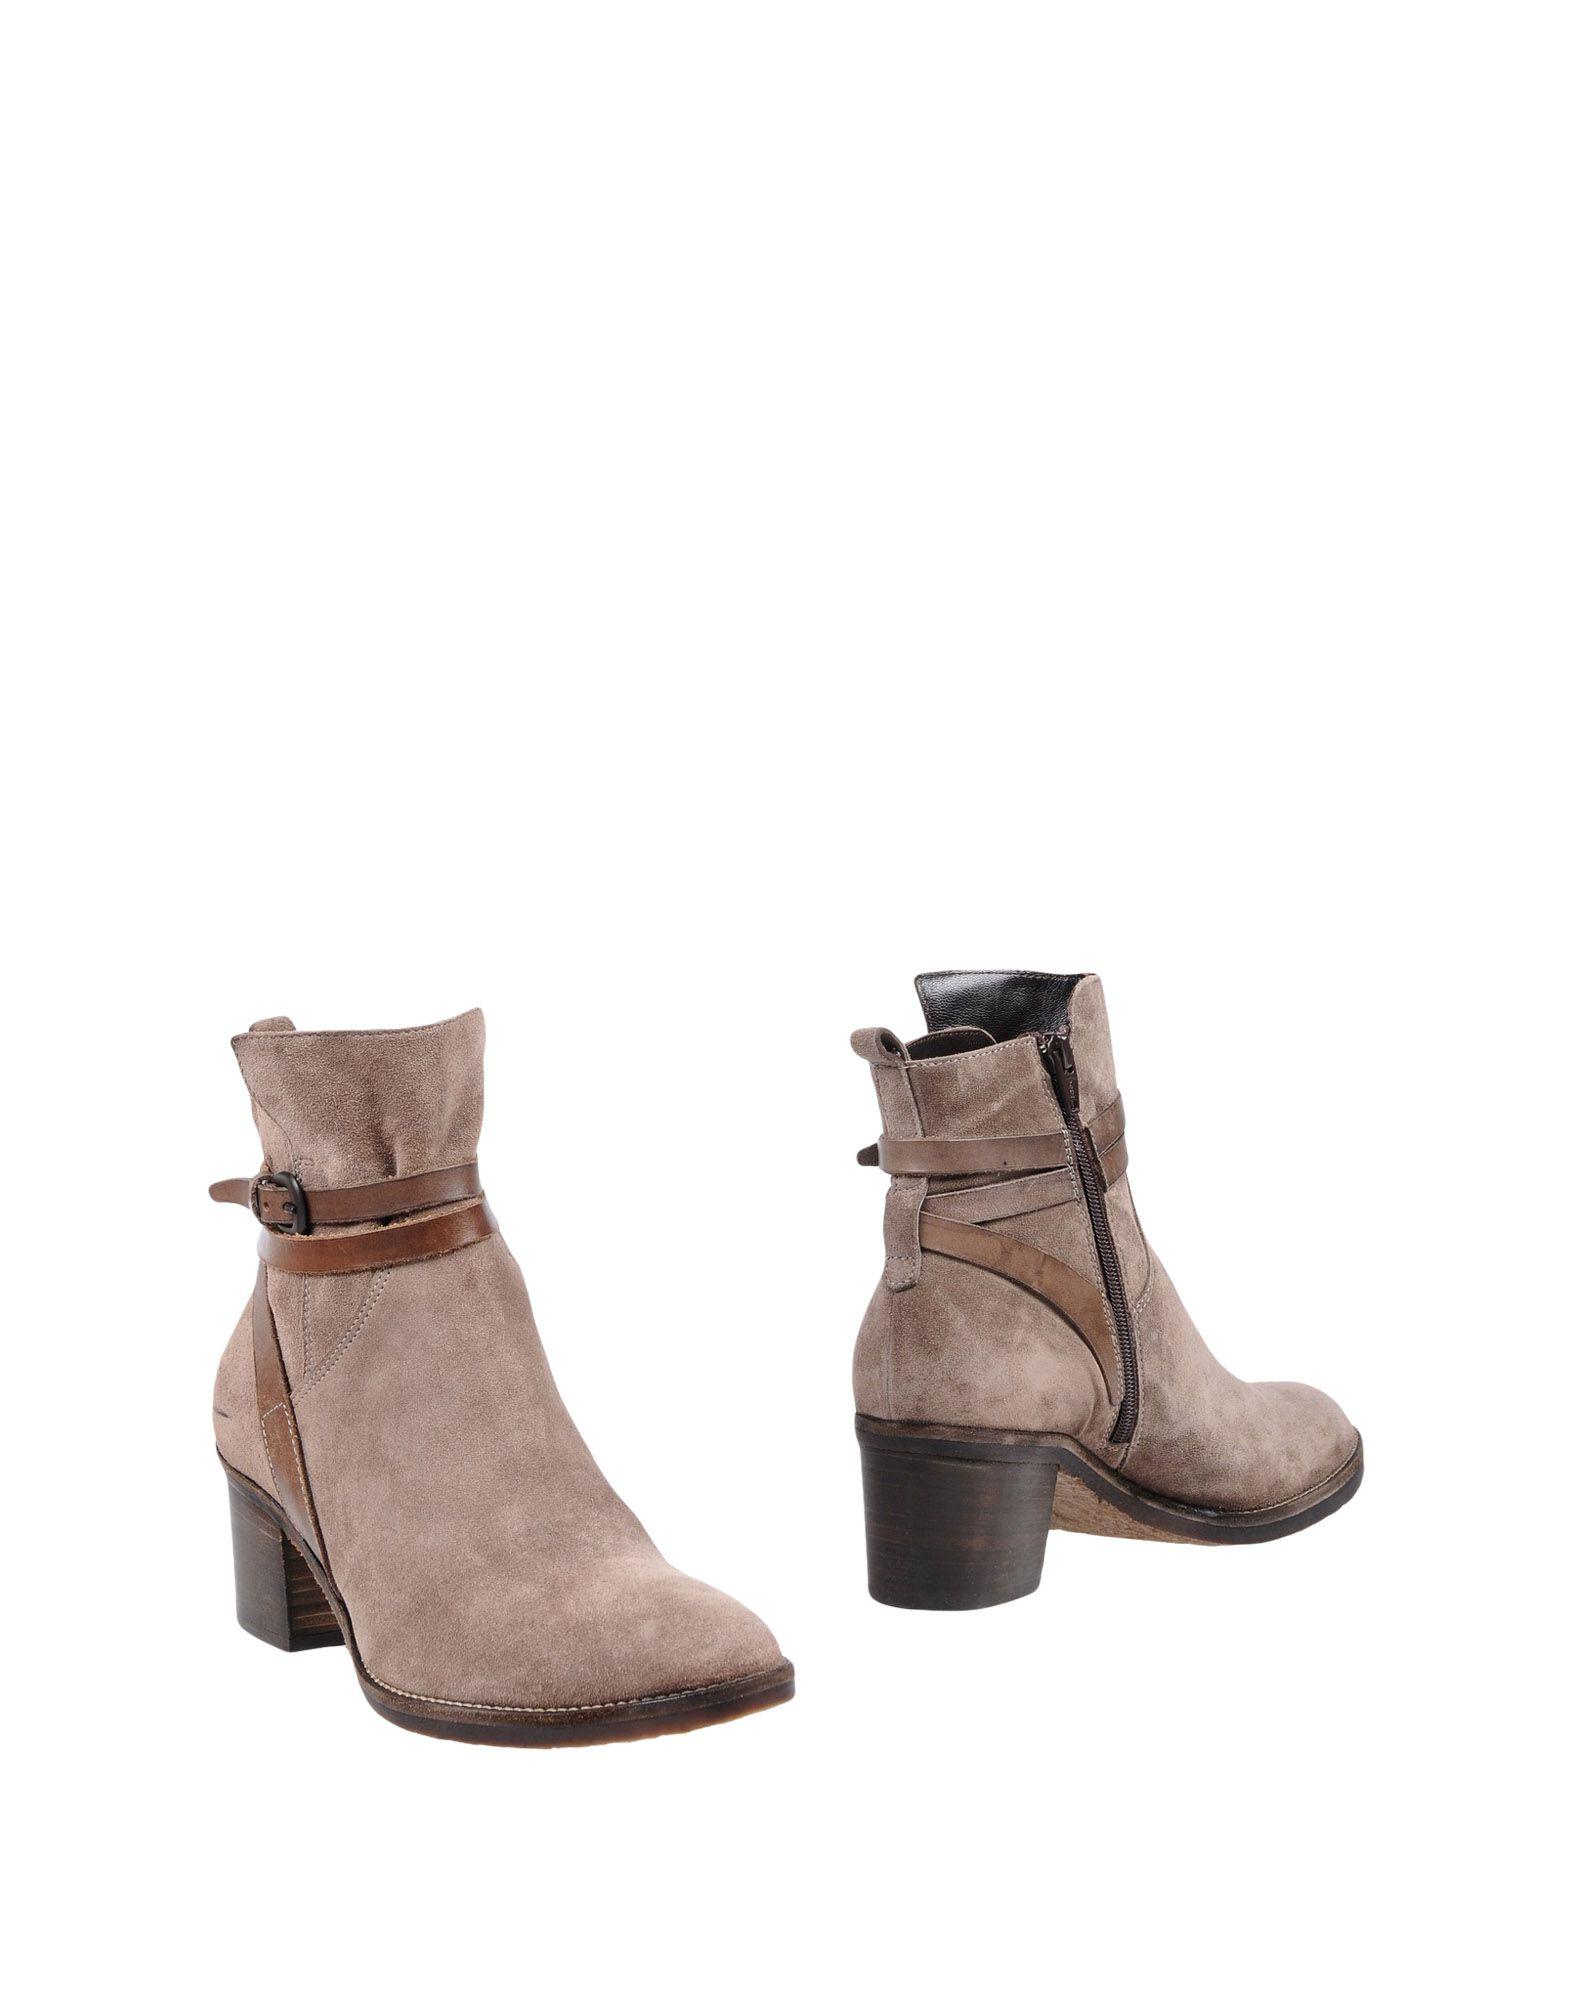 Puritano Stiefelette 11410845TJ Damen  11410845TJ Stiefelette Heiße Schuhe f7872b